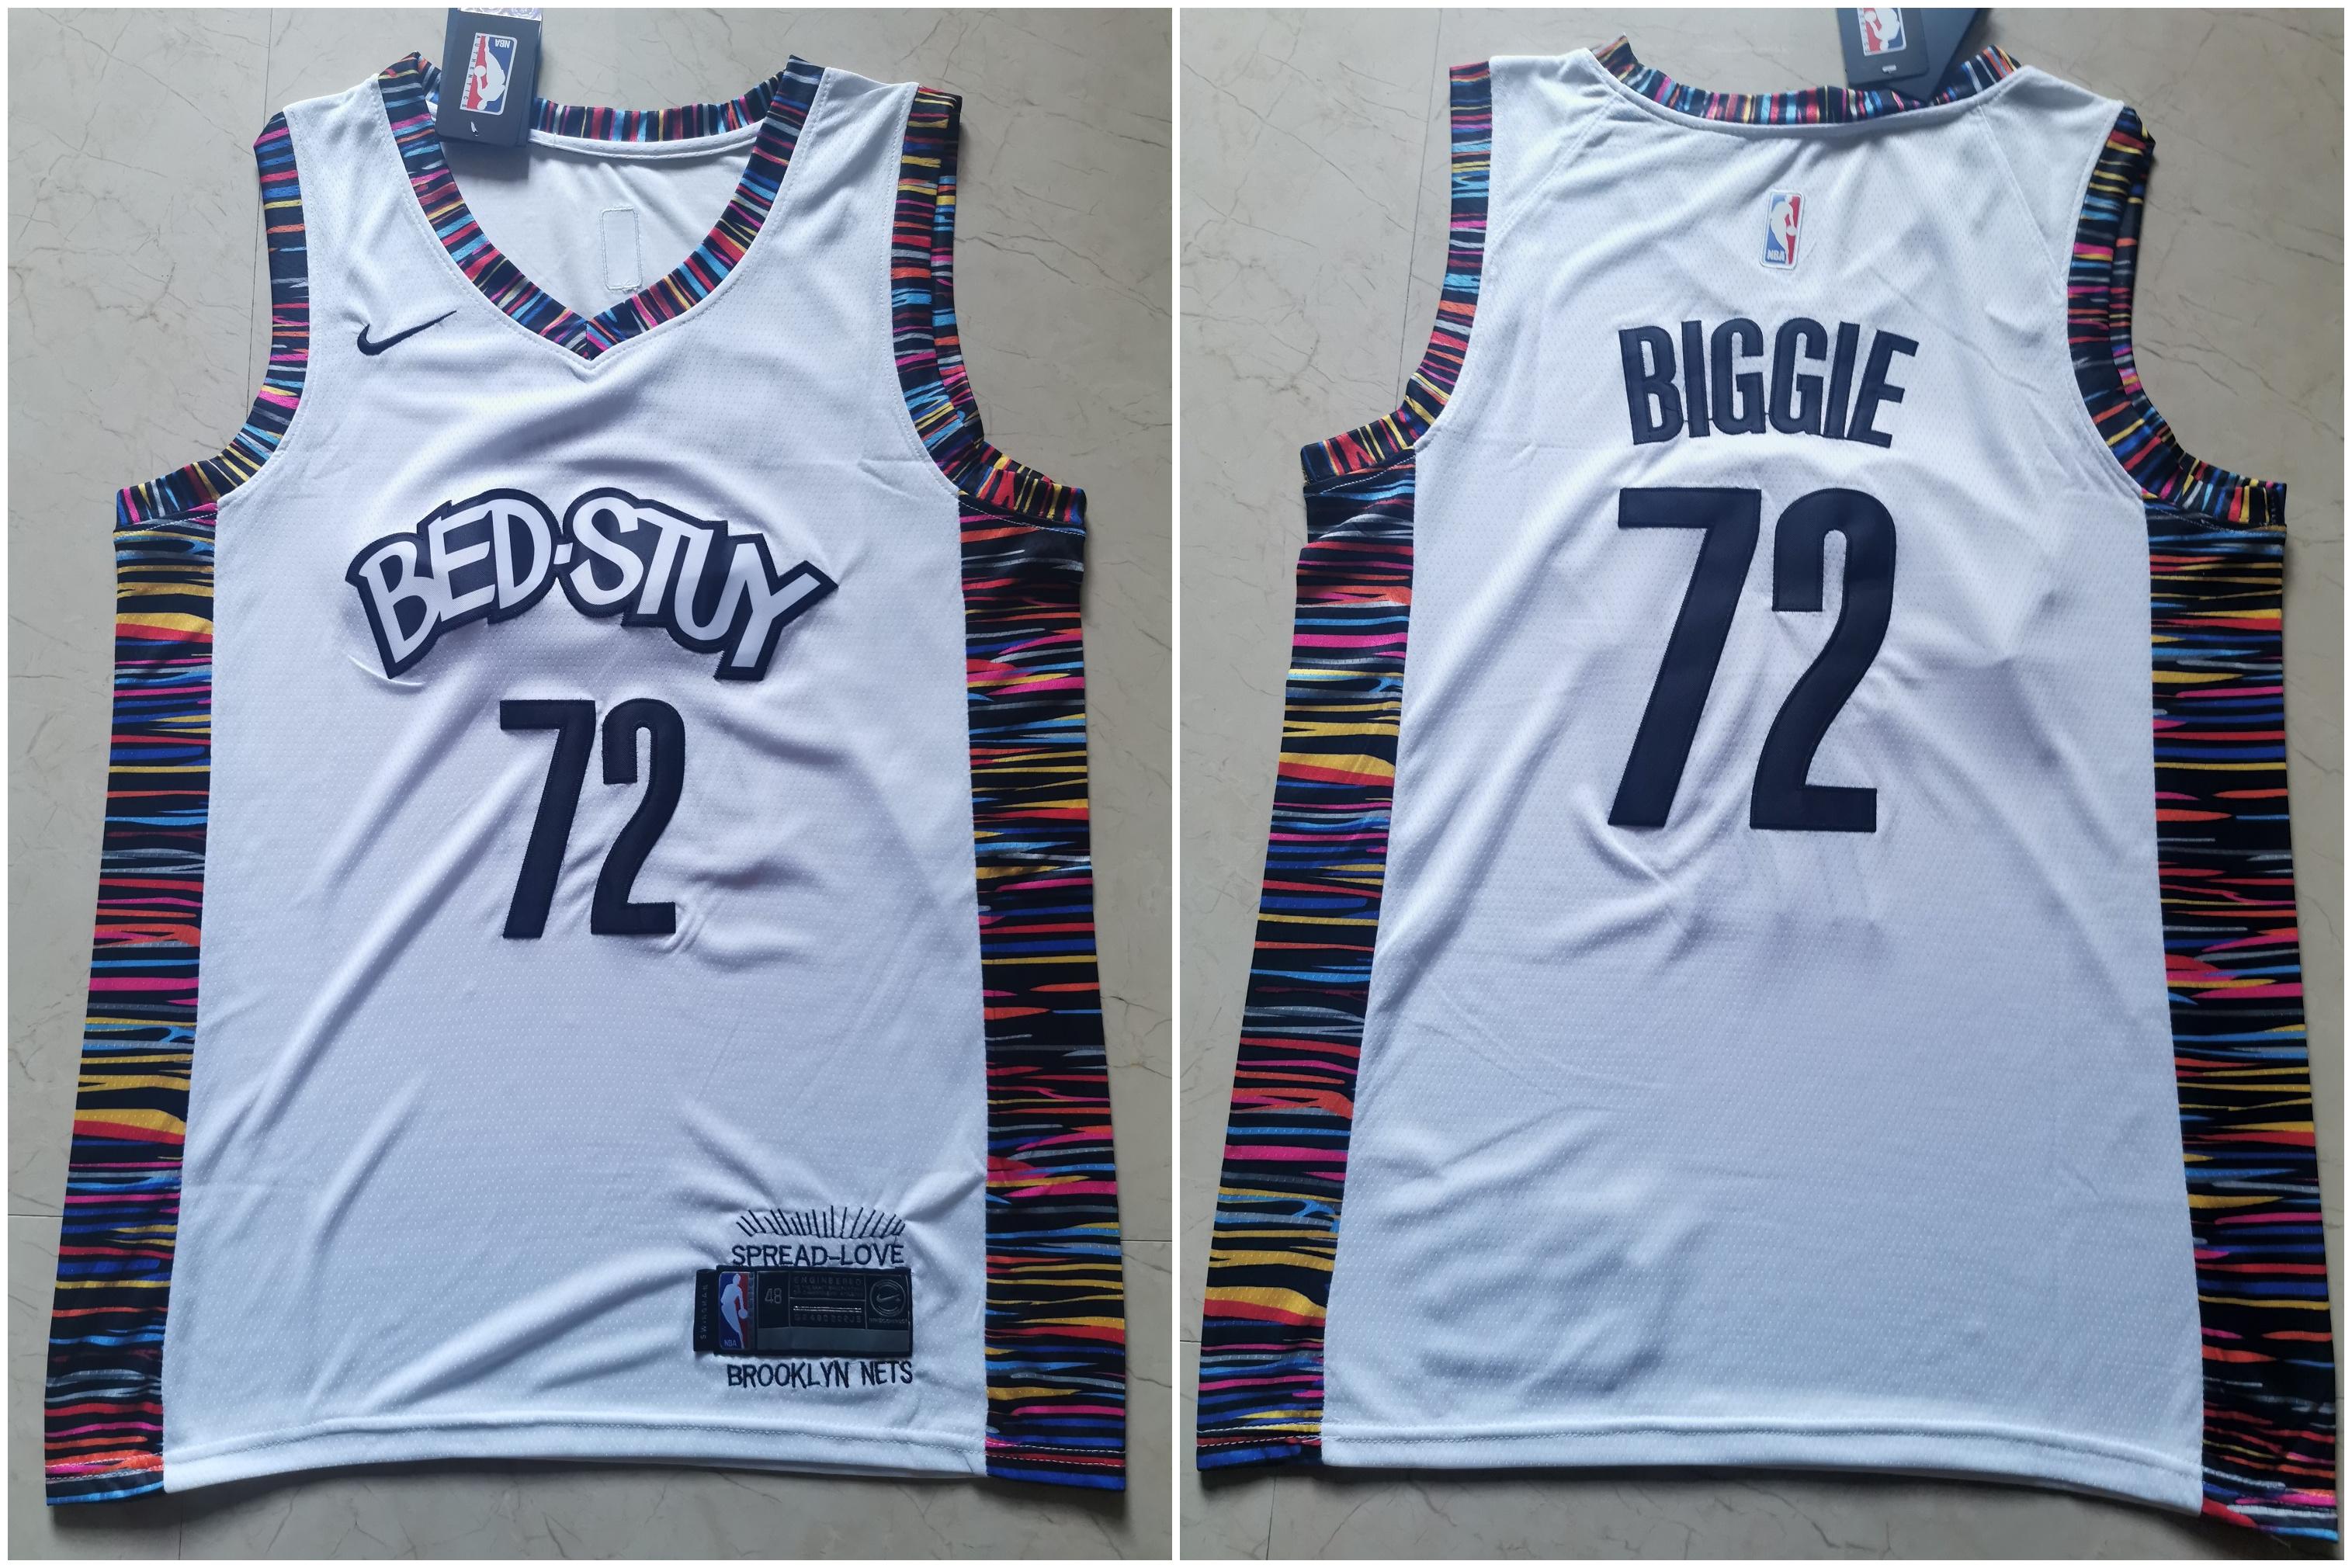 Nets 72 Biggie White 2019-20 City Edition Nike Swingman Jersey